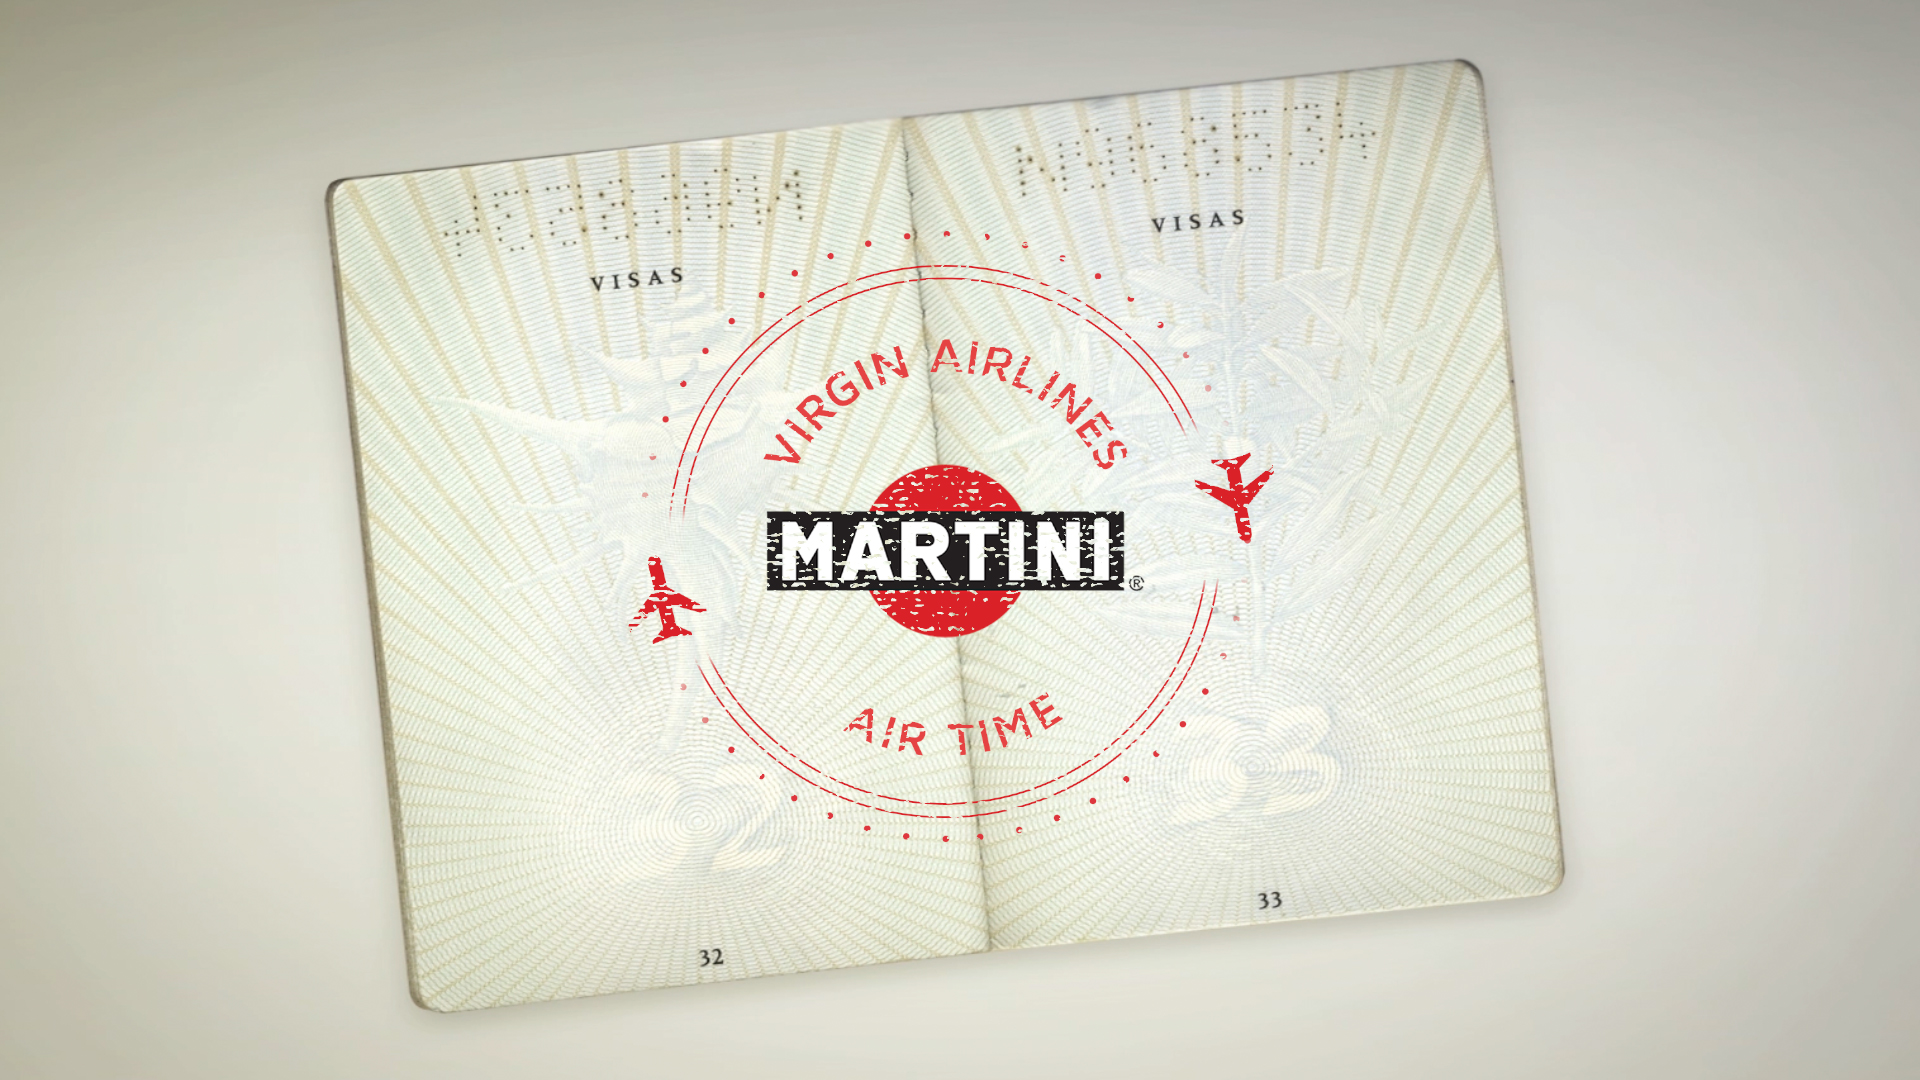 Airtime | Martini | VEGA Digital Awards